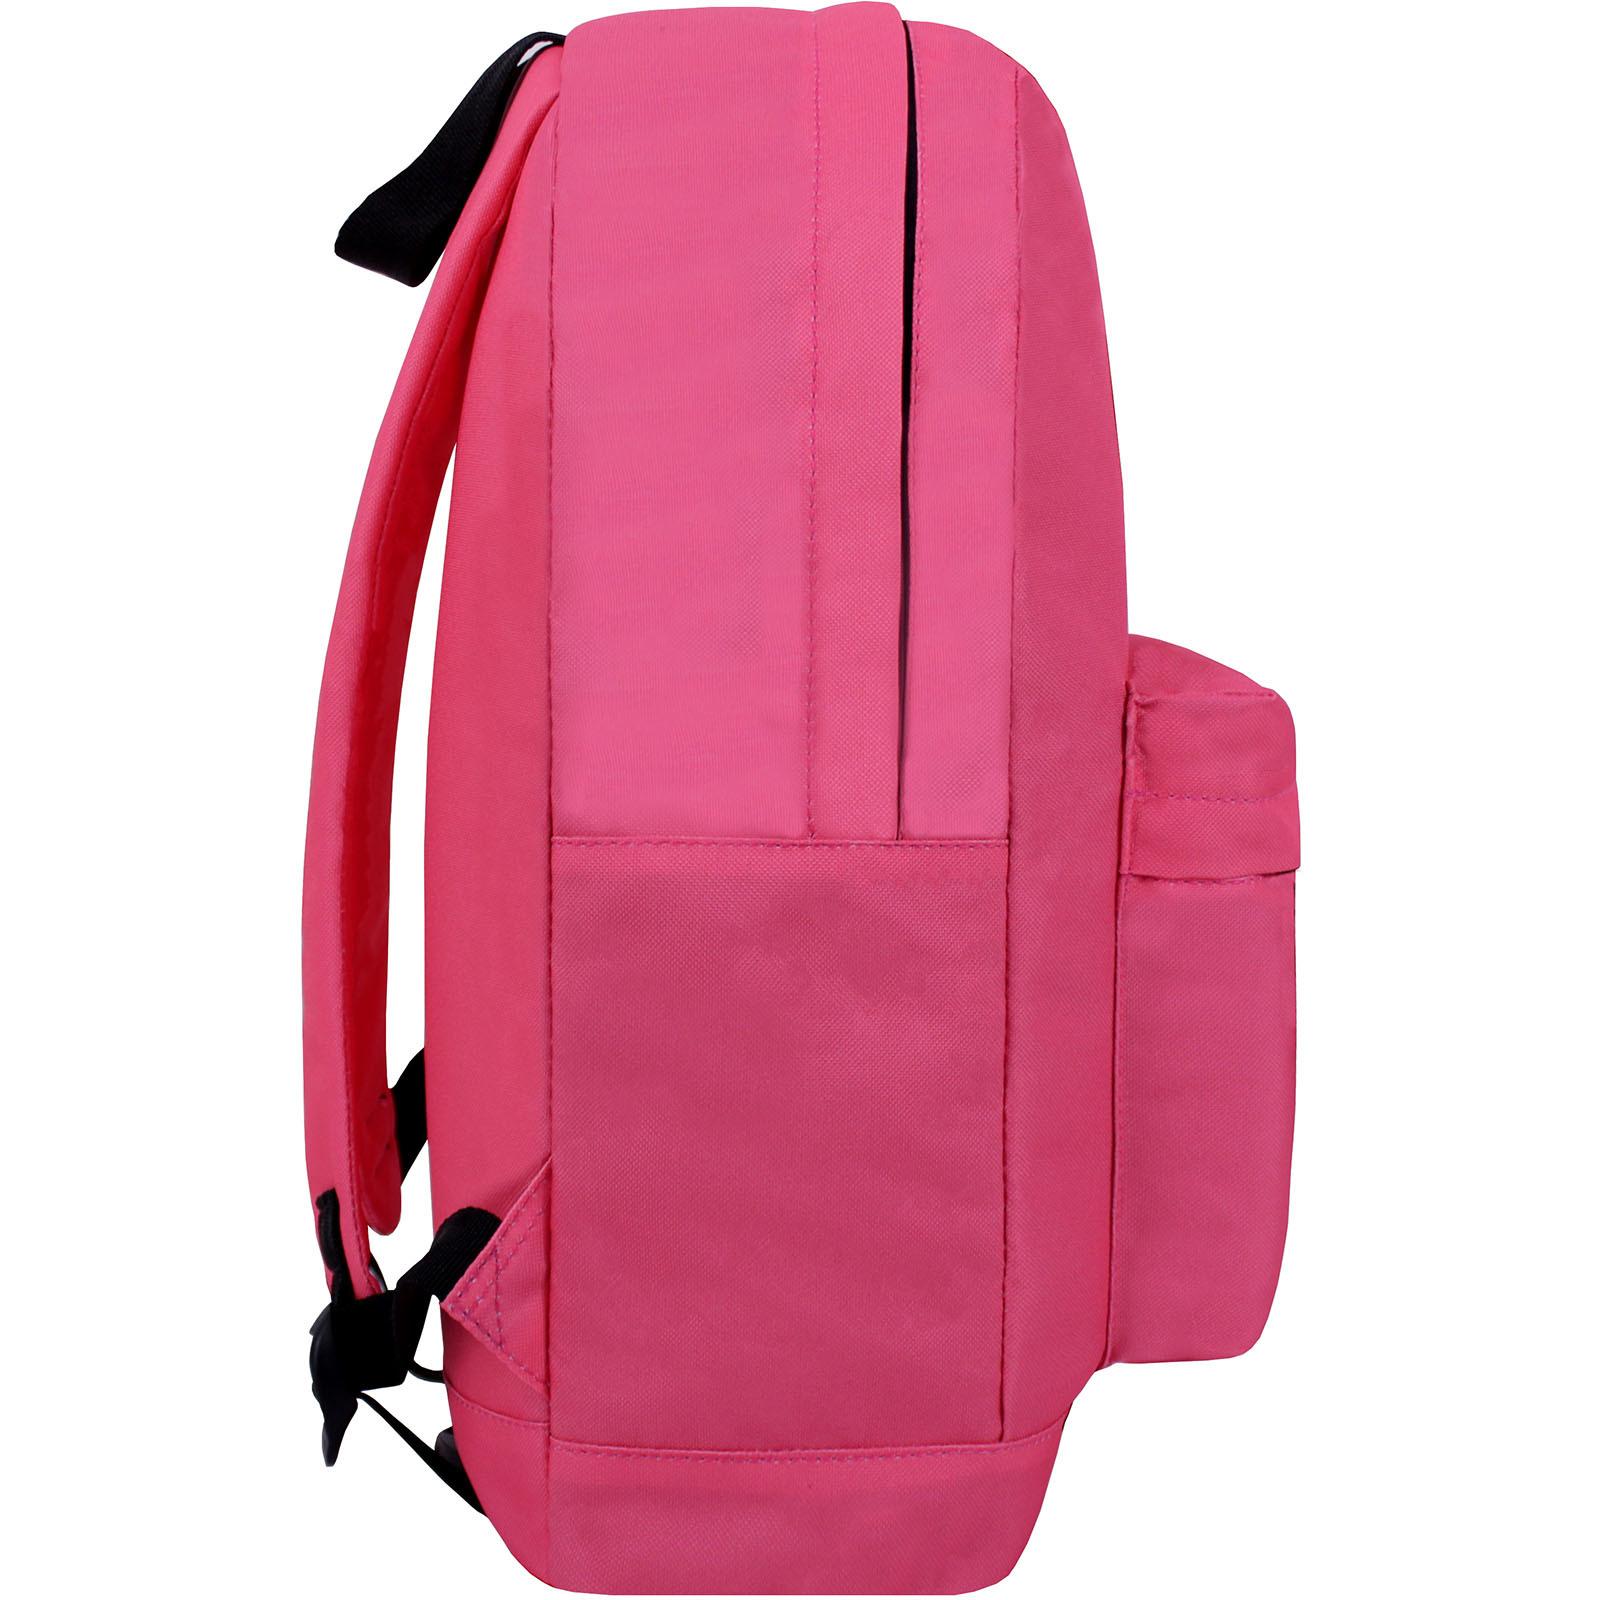 Рюкзак Bagland Молодежный W/R 17 л. Розовый (00533664 Ш) фото 6